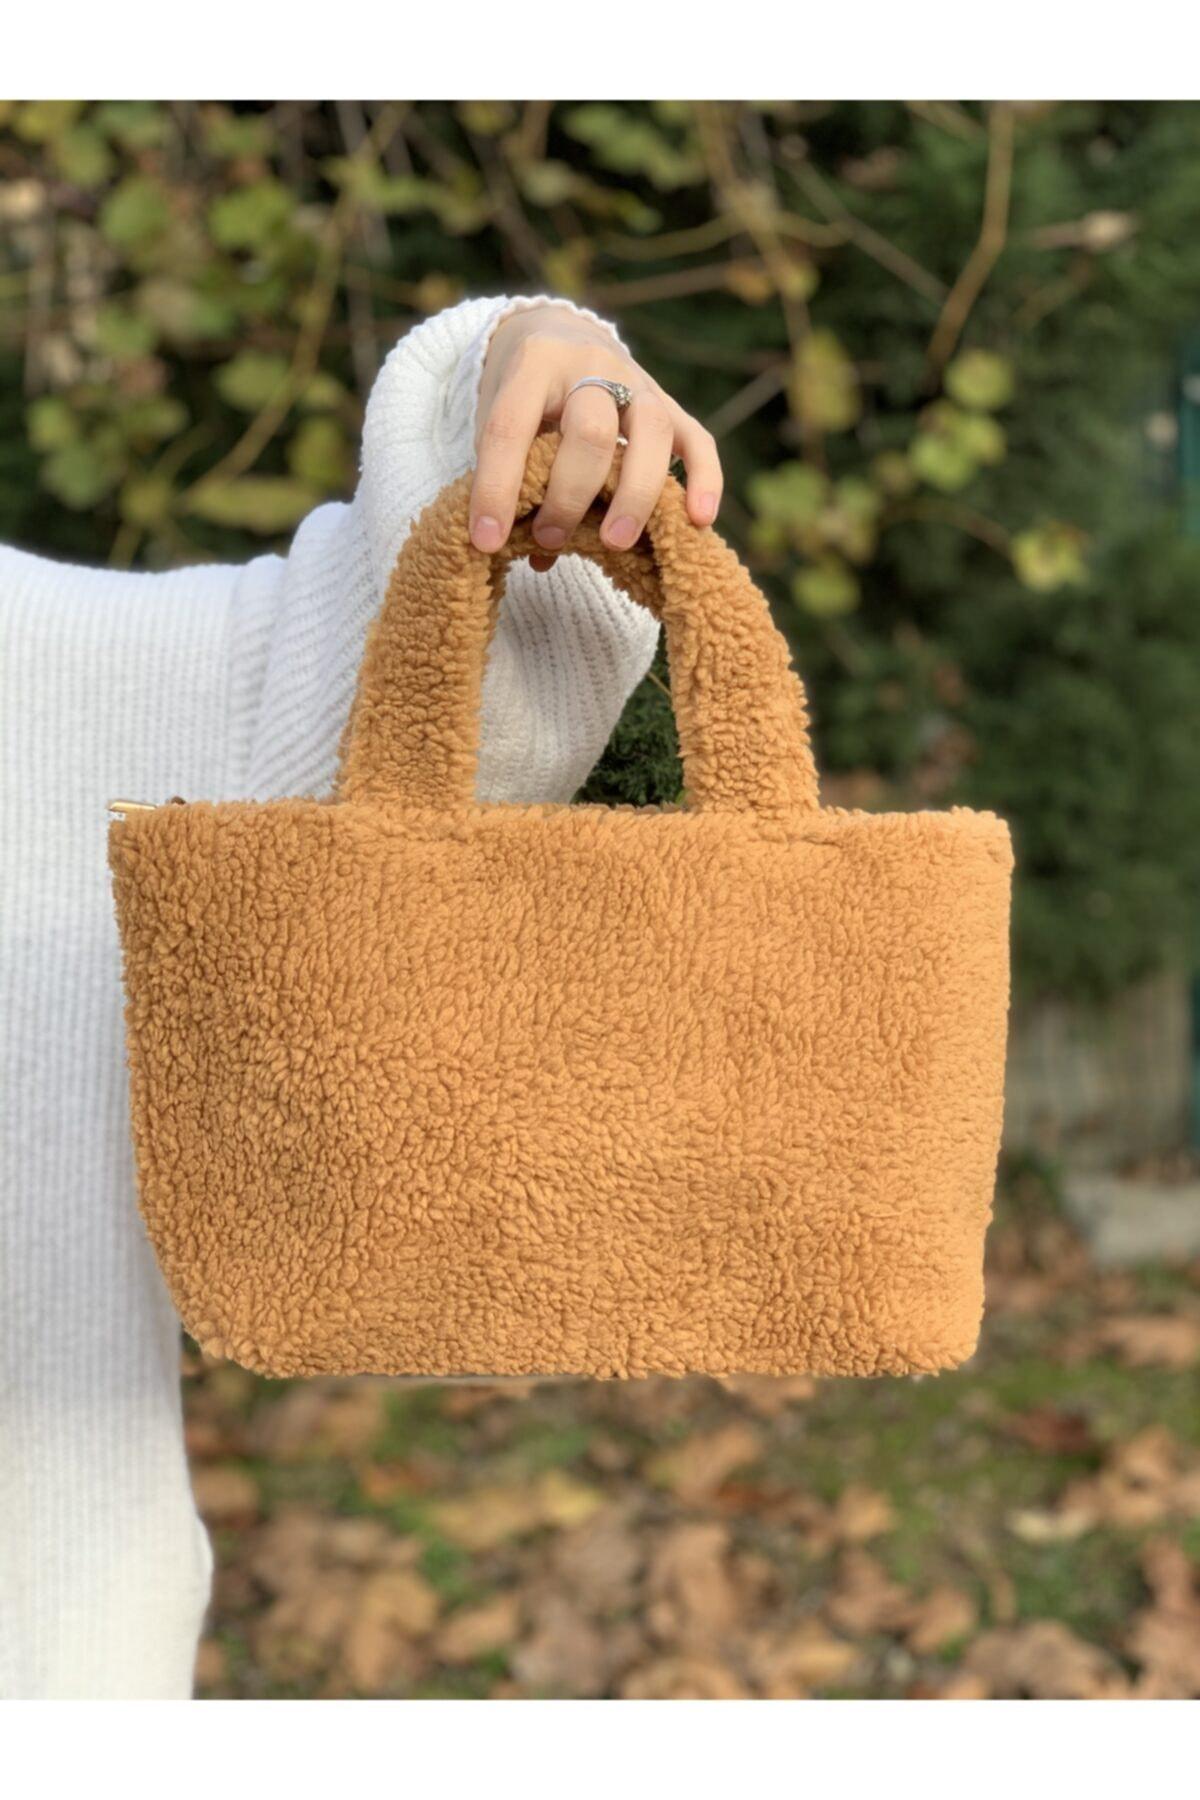 Women Mustard Plush Shoulder Bag Handbag Bag Accessory Pouch Vıntage Hermes Girl Teenager Casual Special Pochette Wallet Clutch